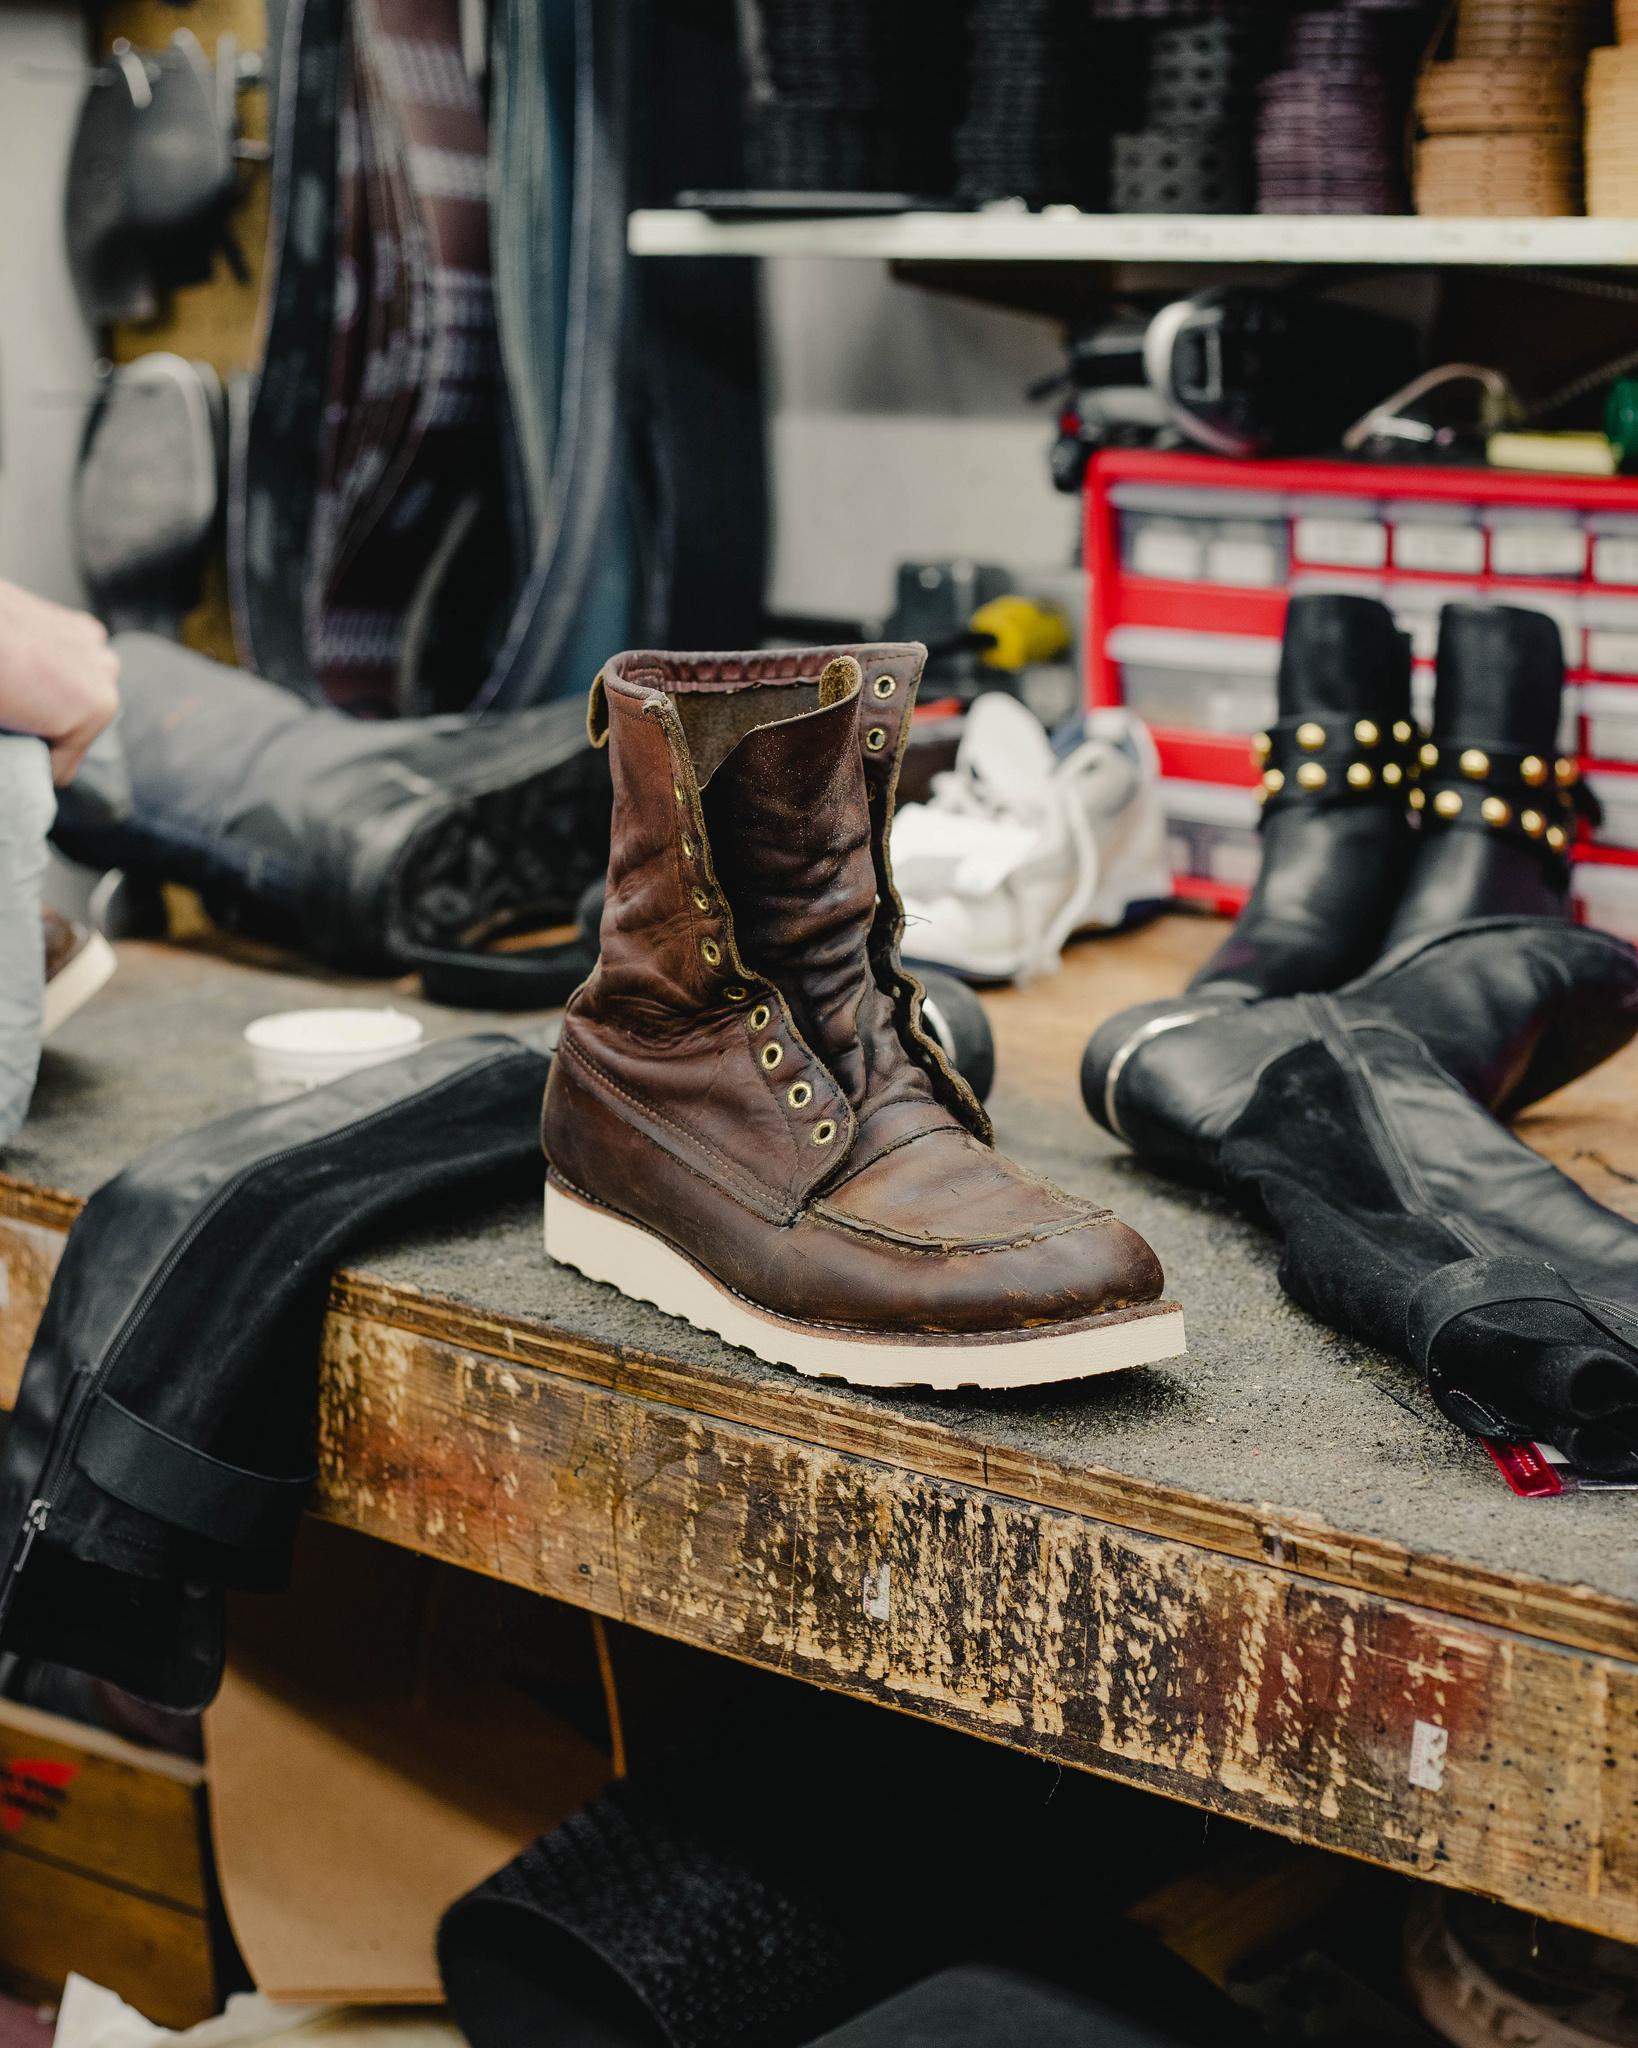 DeVito Shoe Repair: An inside look